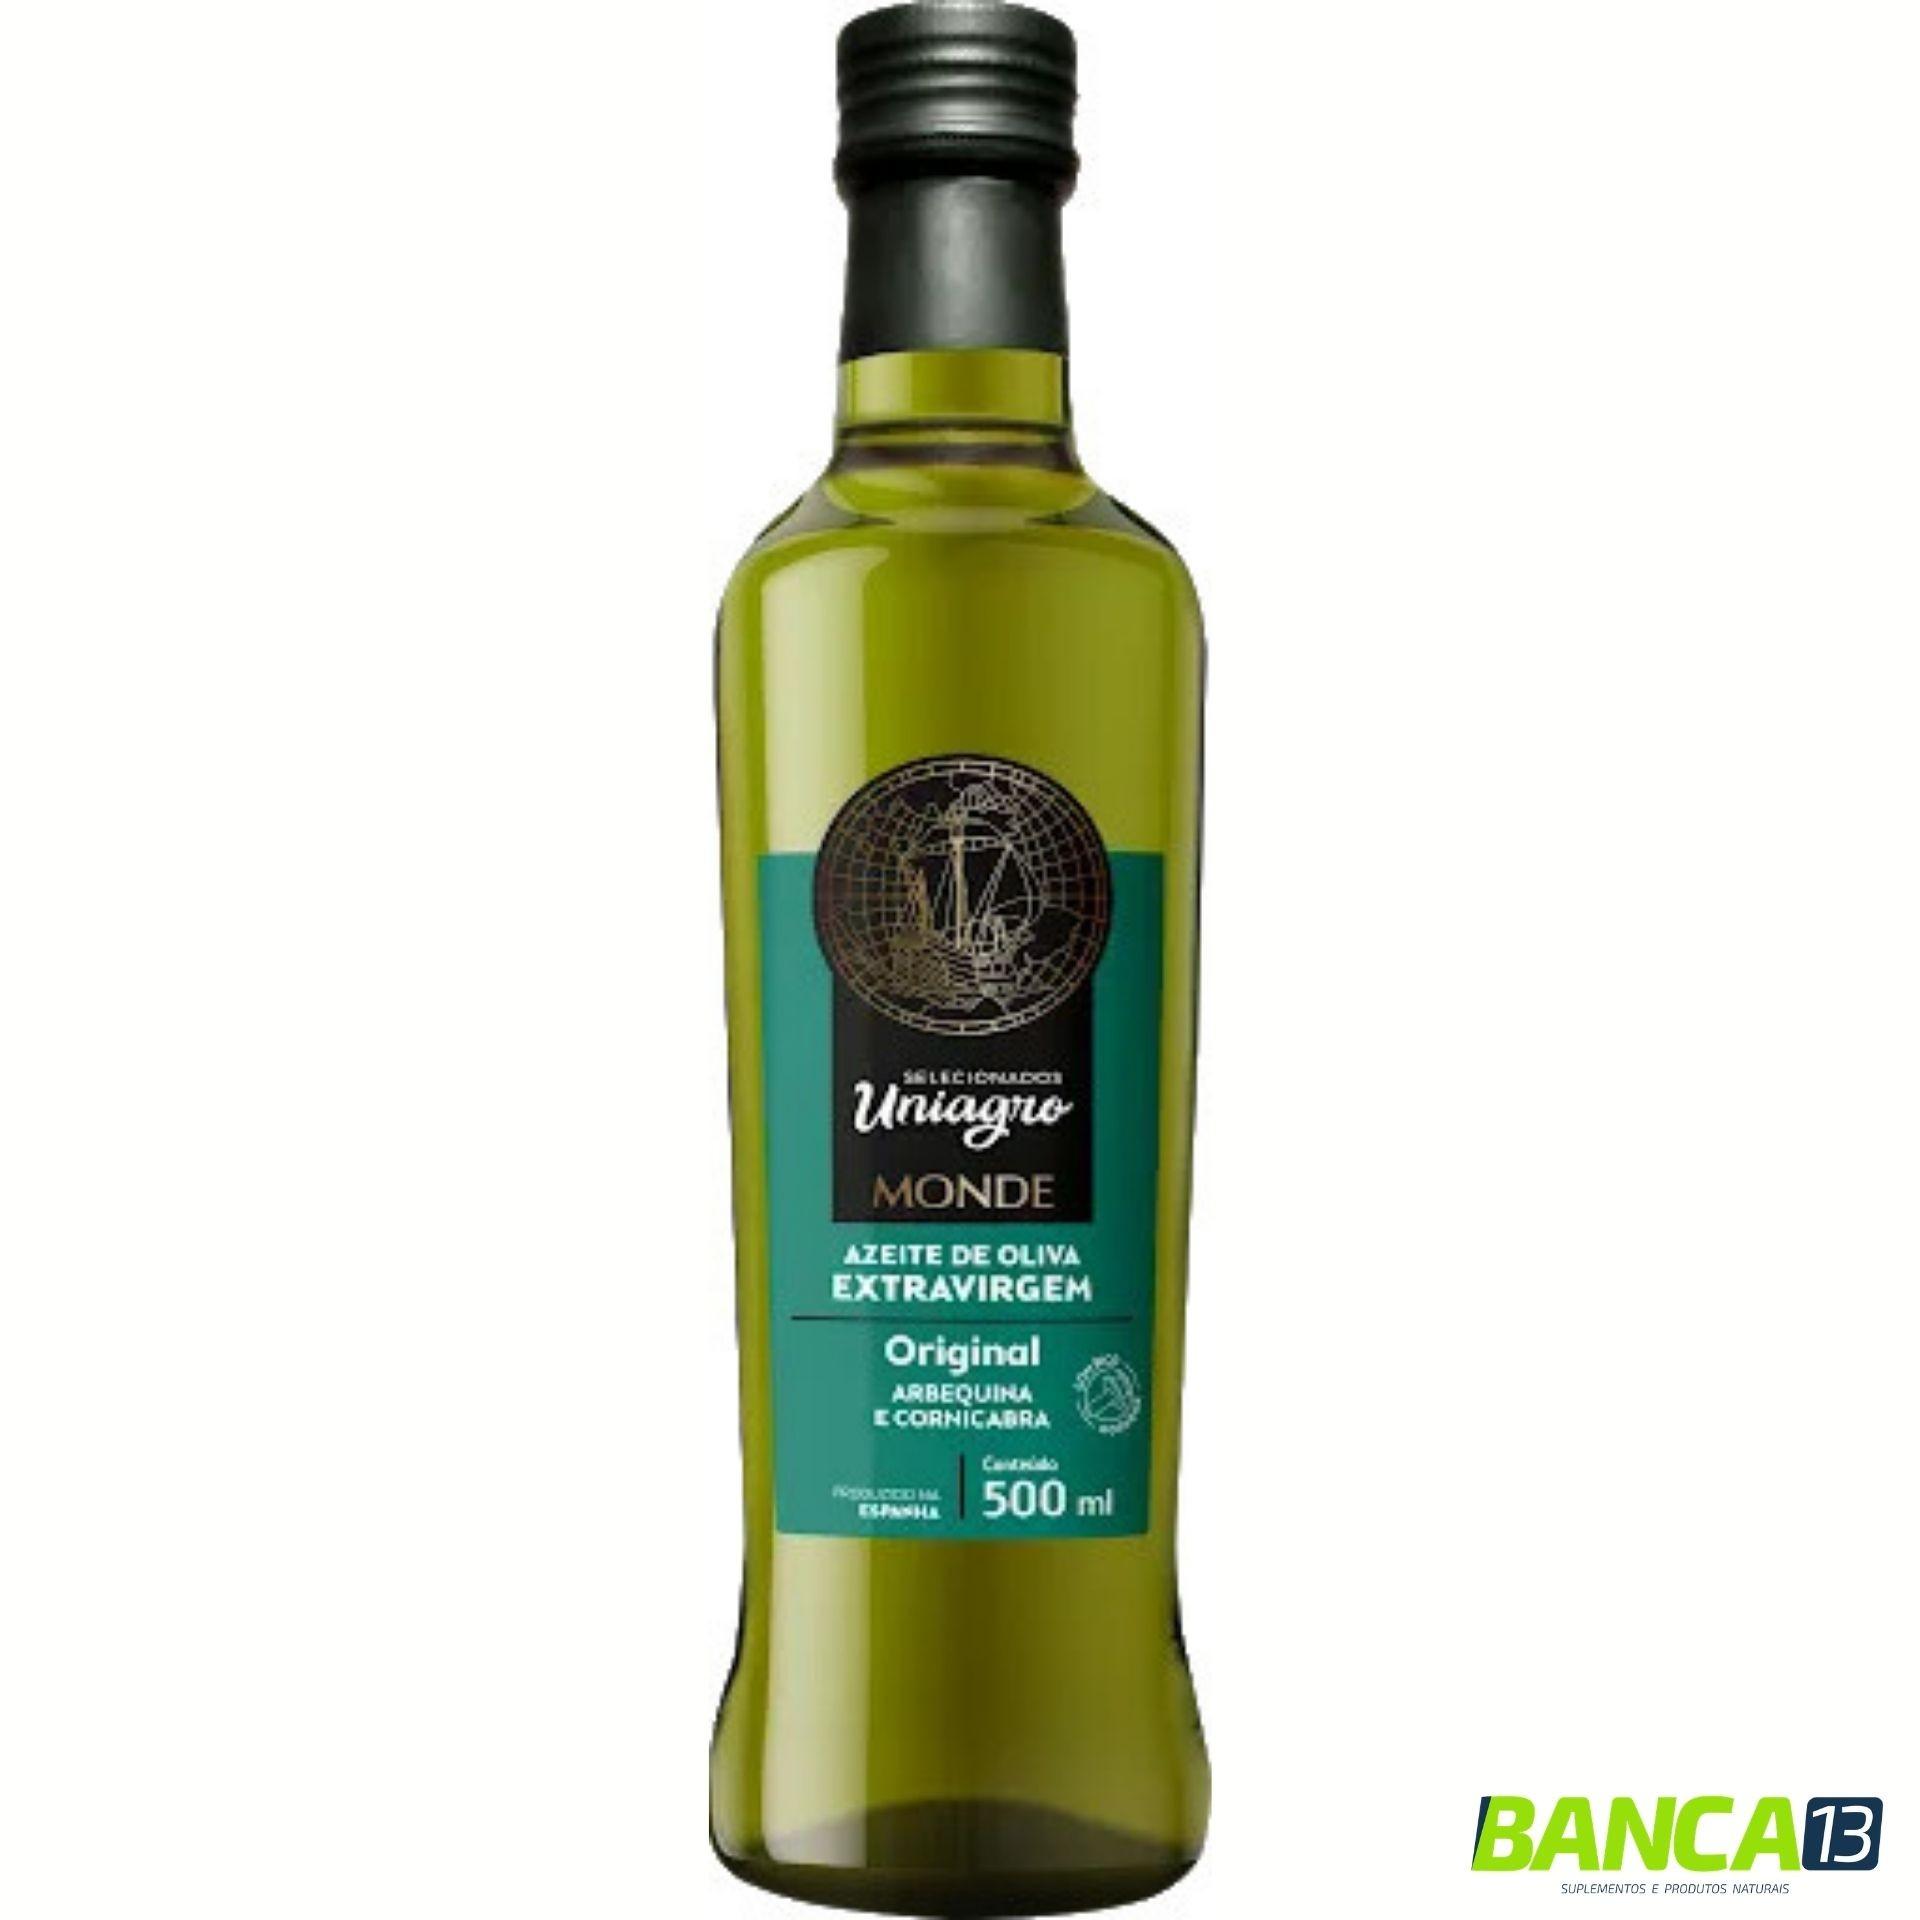 Azeite de Oliva Extra Virgem 500ml - Uniagro